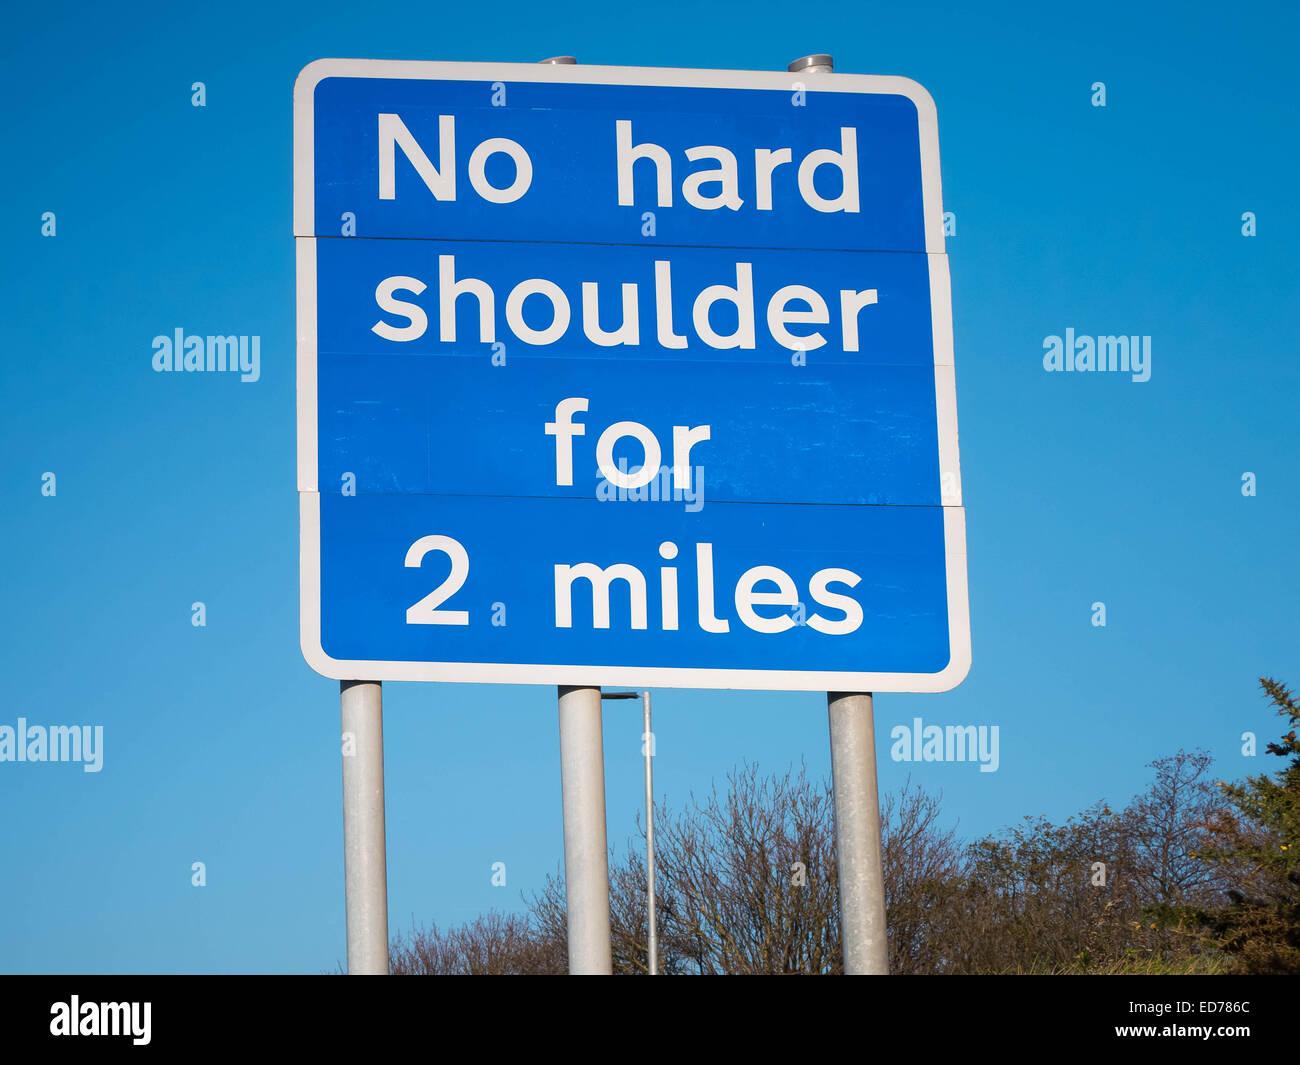 Motorway sign declaring 'No hard shoulder for 2 miles' - Stock Image